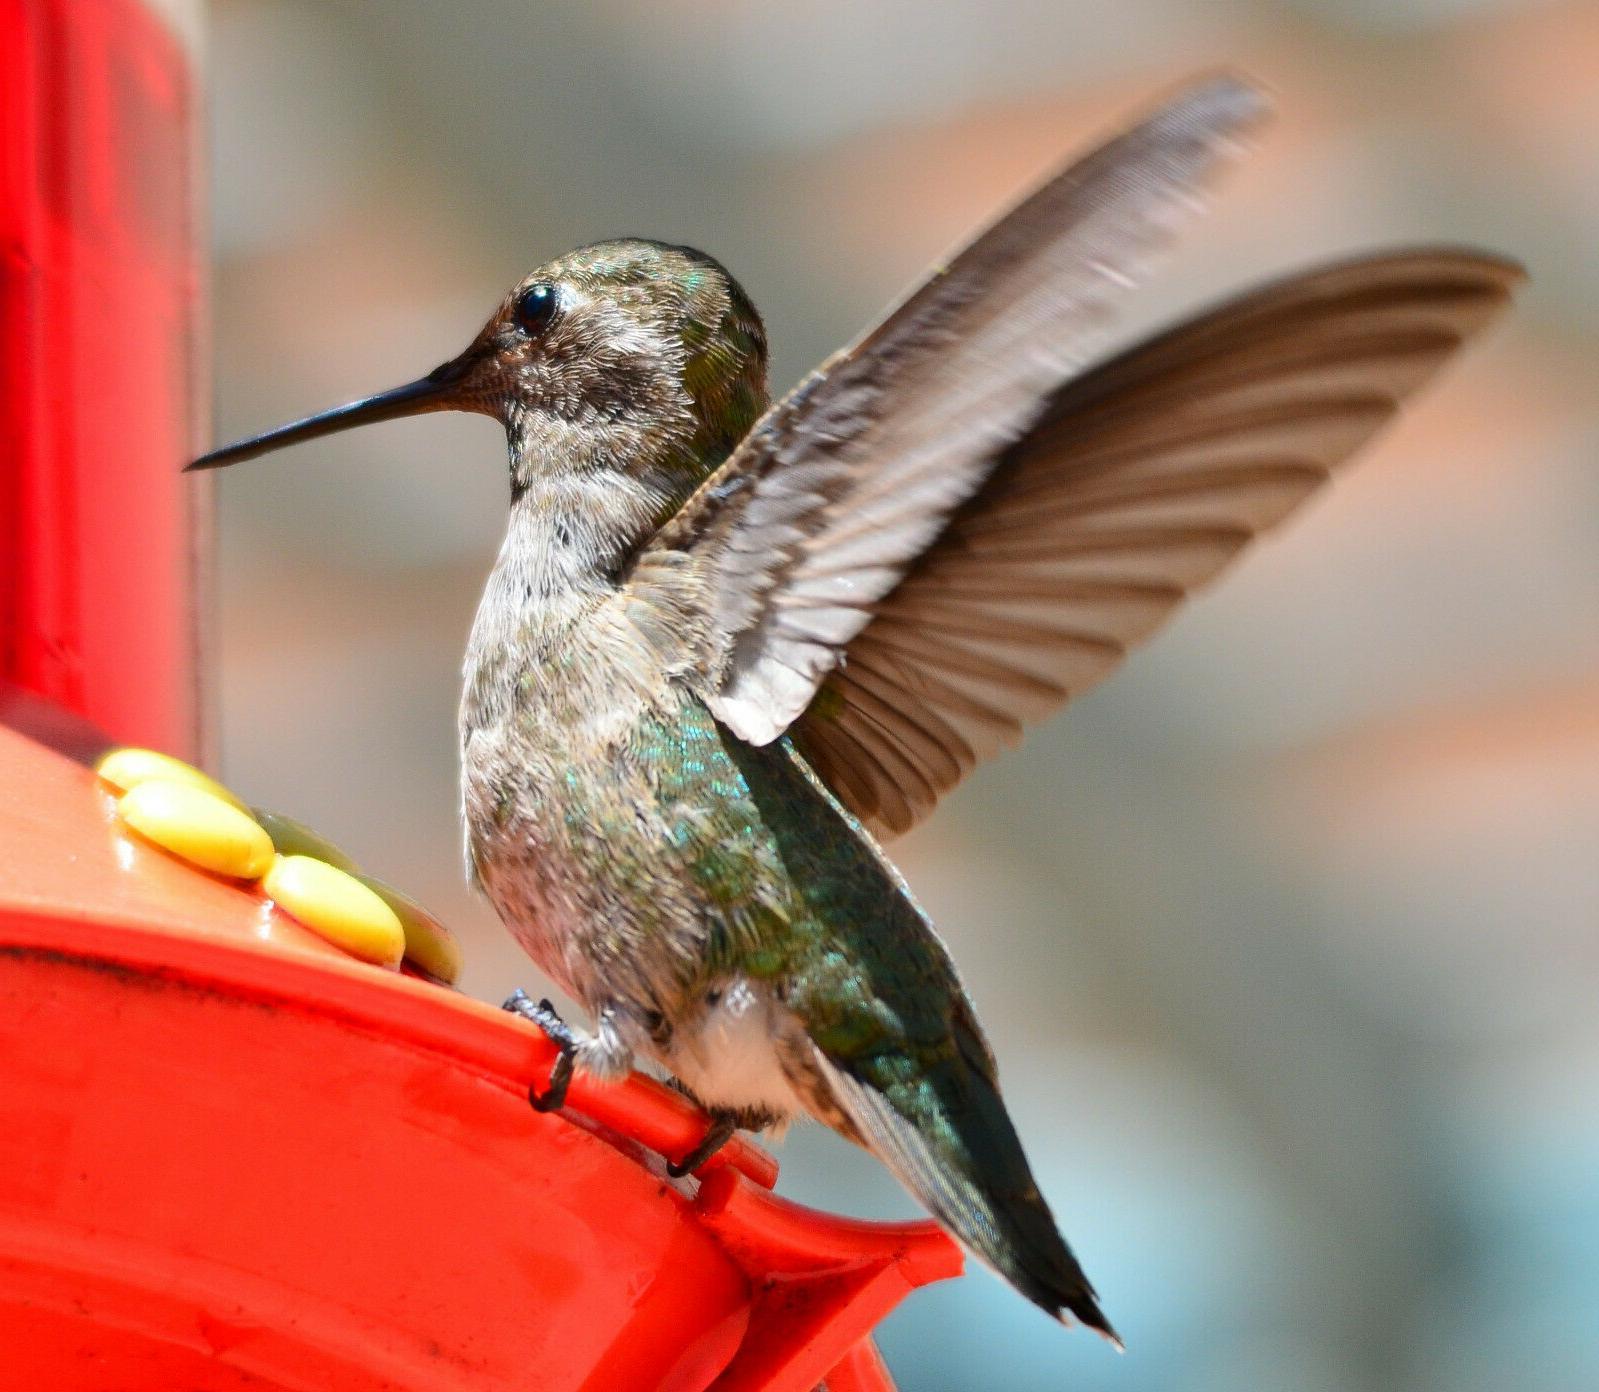 SPRINGTIME SPECIAL!! SET OF QUALITY GARDEN COLLECTION HUMMINGBIRD FEEDERS